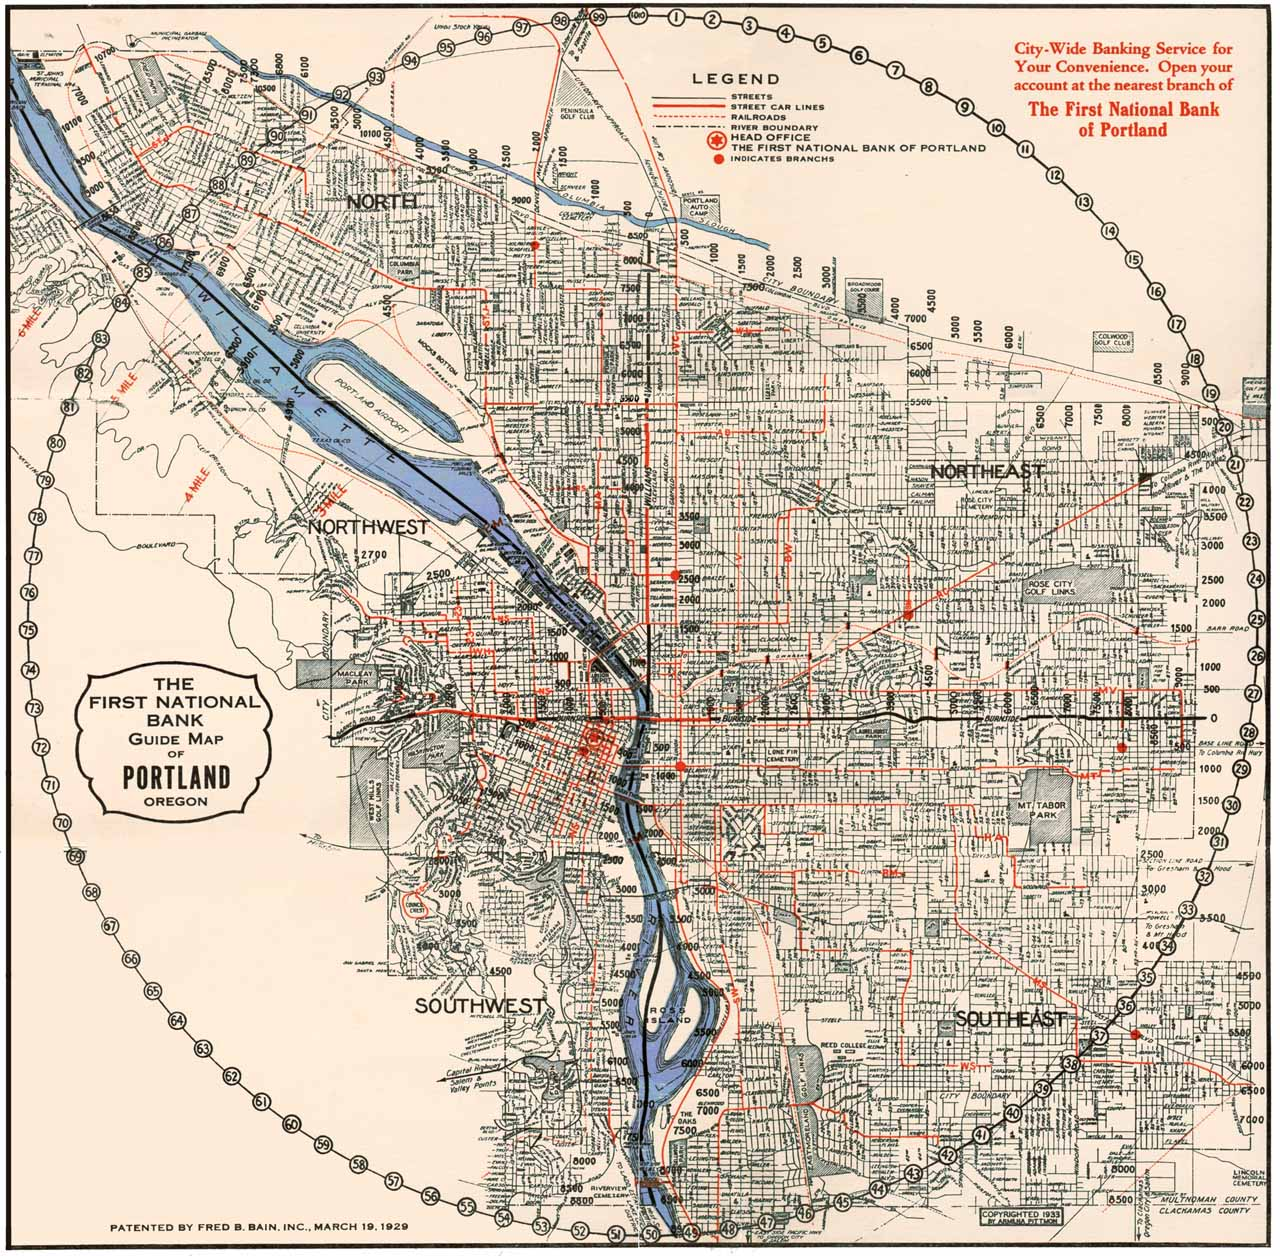 Street Railway Map of Portland (1904)